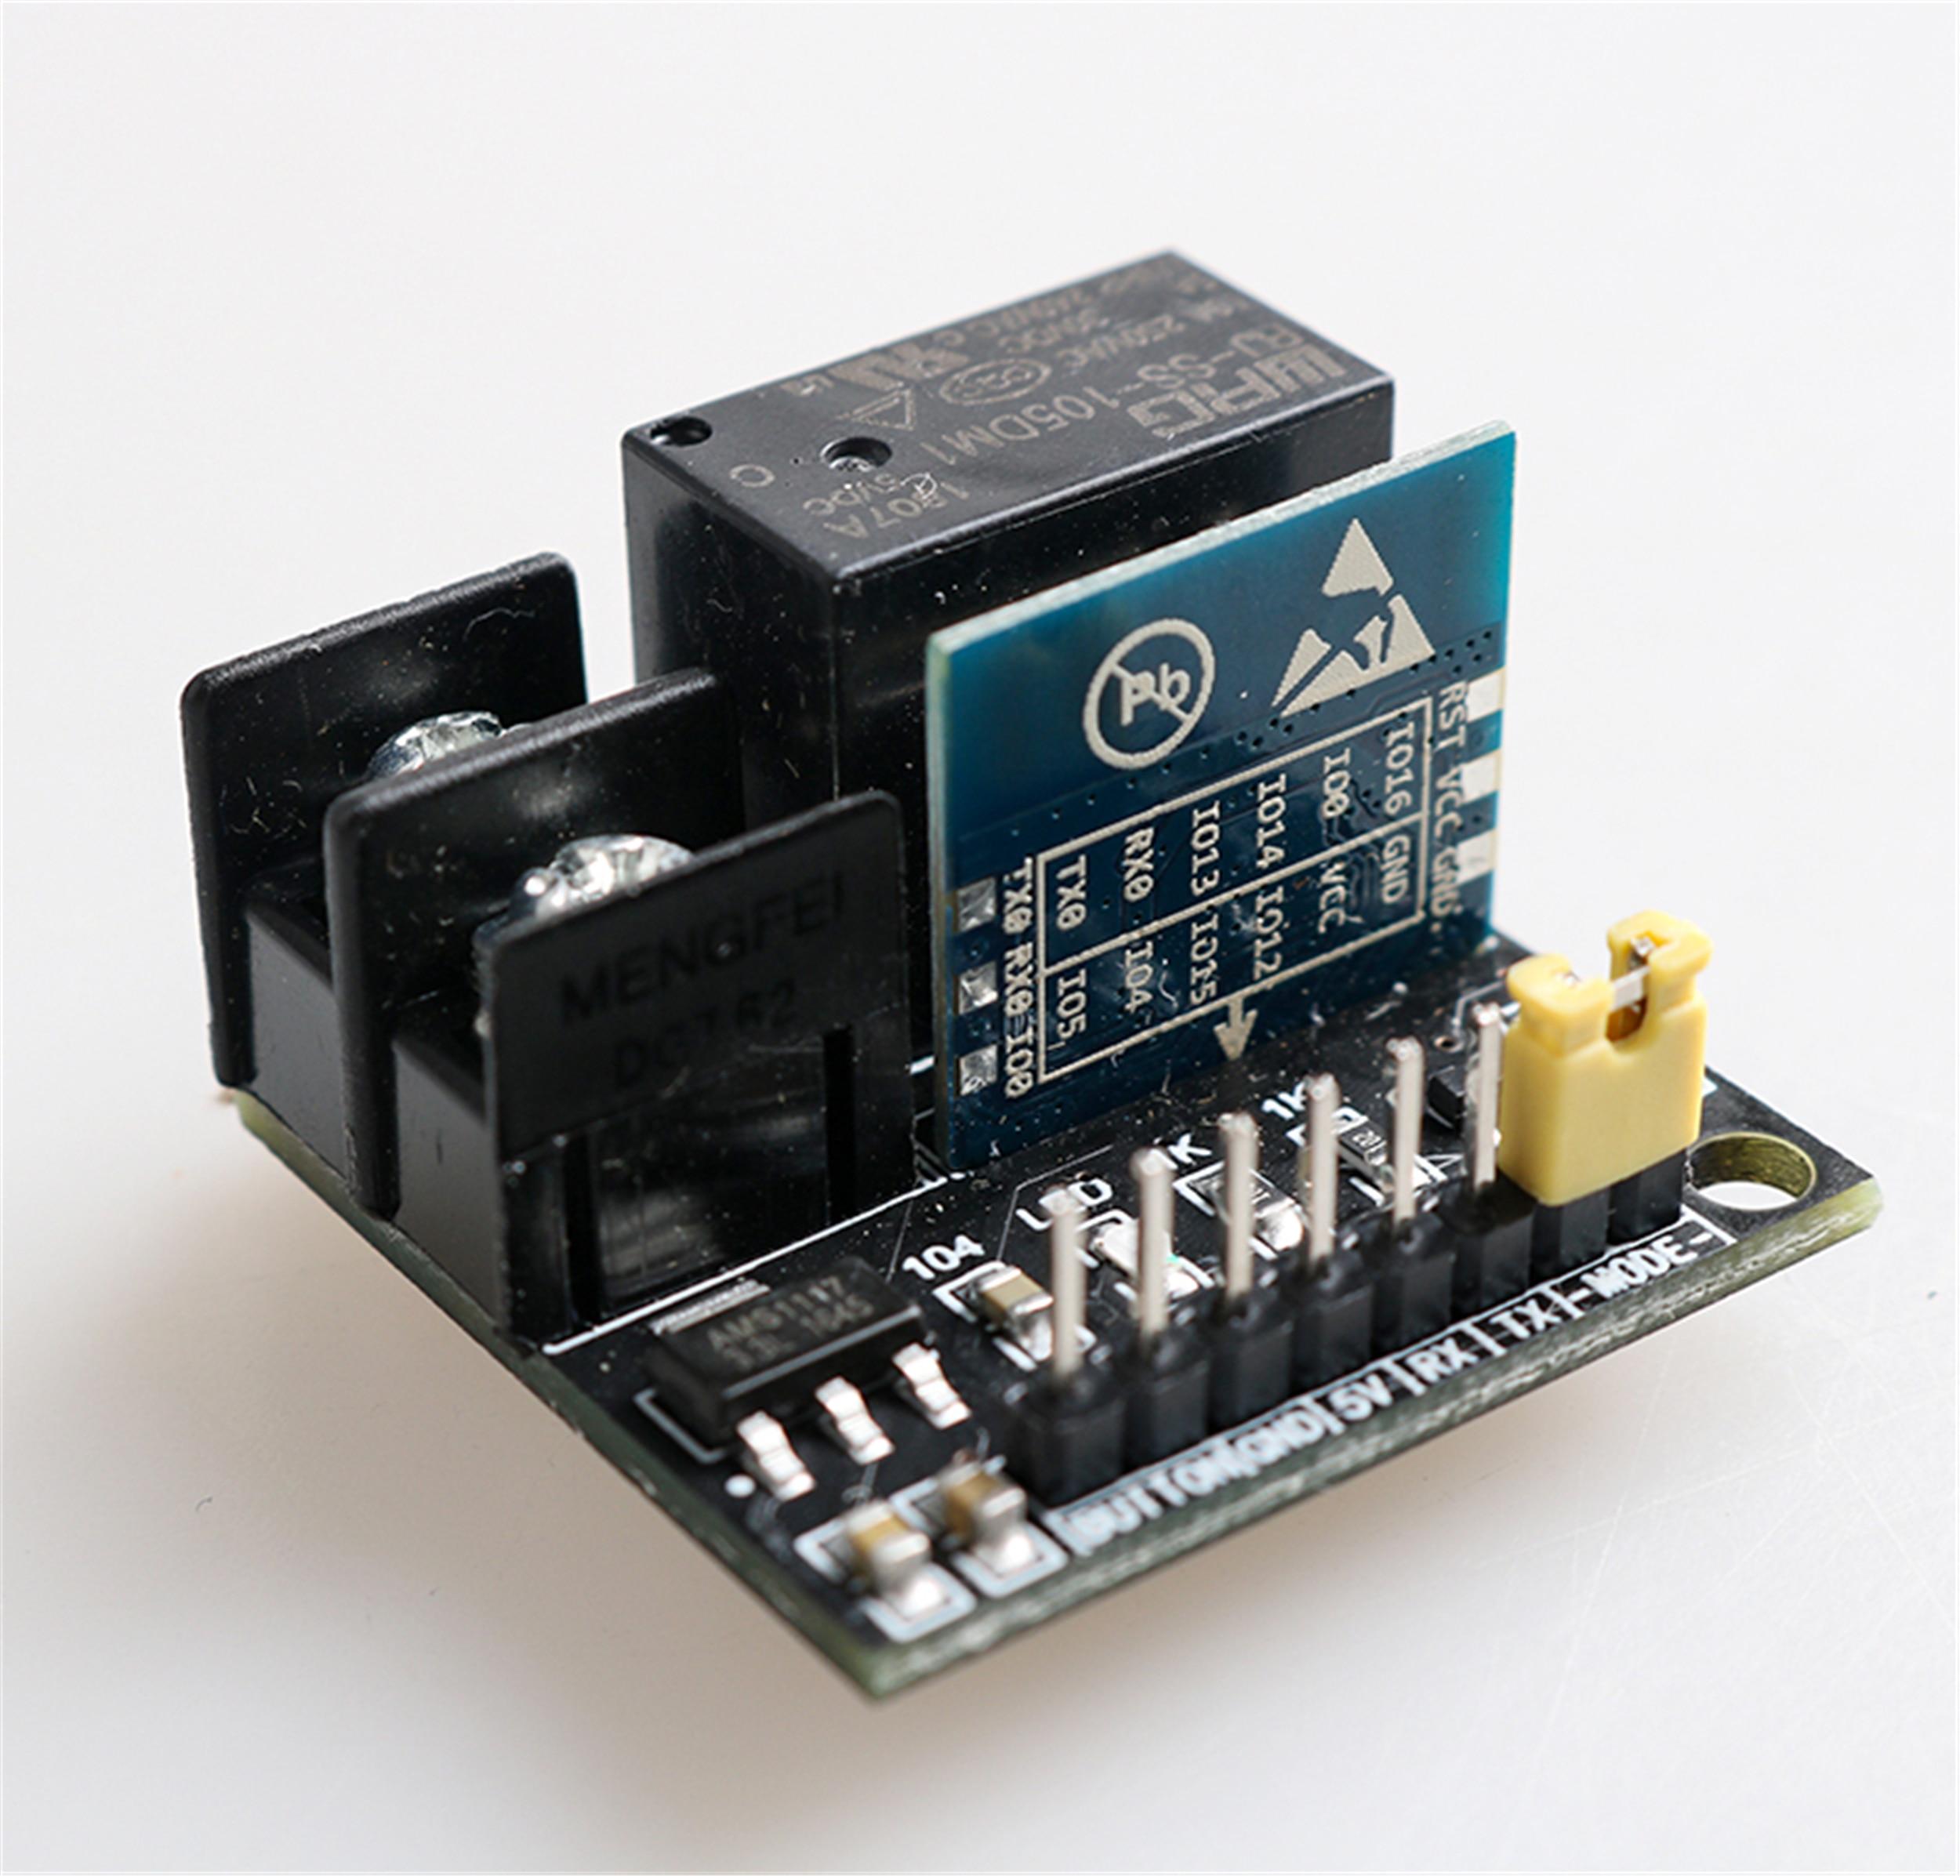 Enchufe WiFi, interruptor de relé inteligente, toma de Control remoto, 1 canal, módulo de relé DC 5V, funciona con Siri (sin Apple MFI)/Alexa/Google